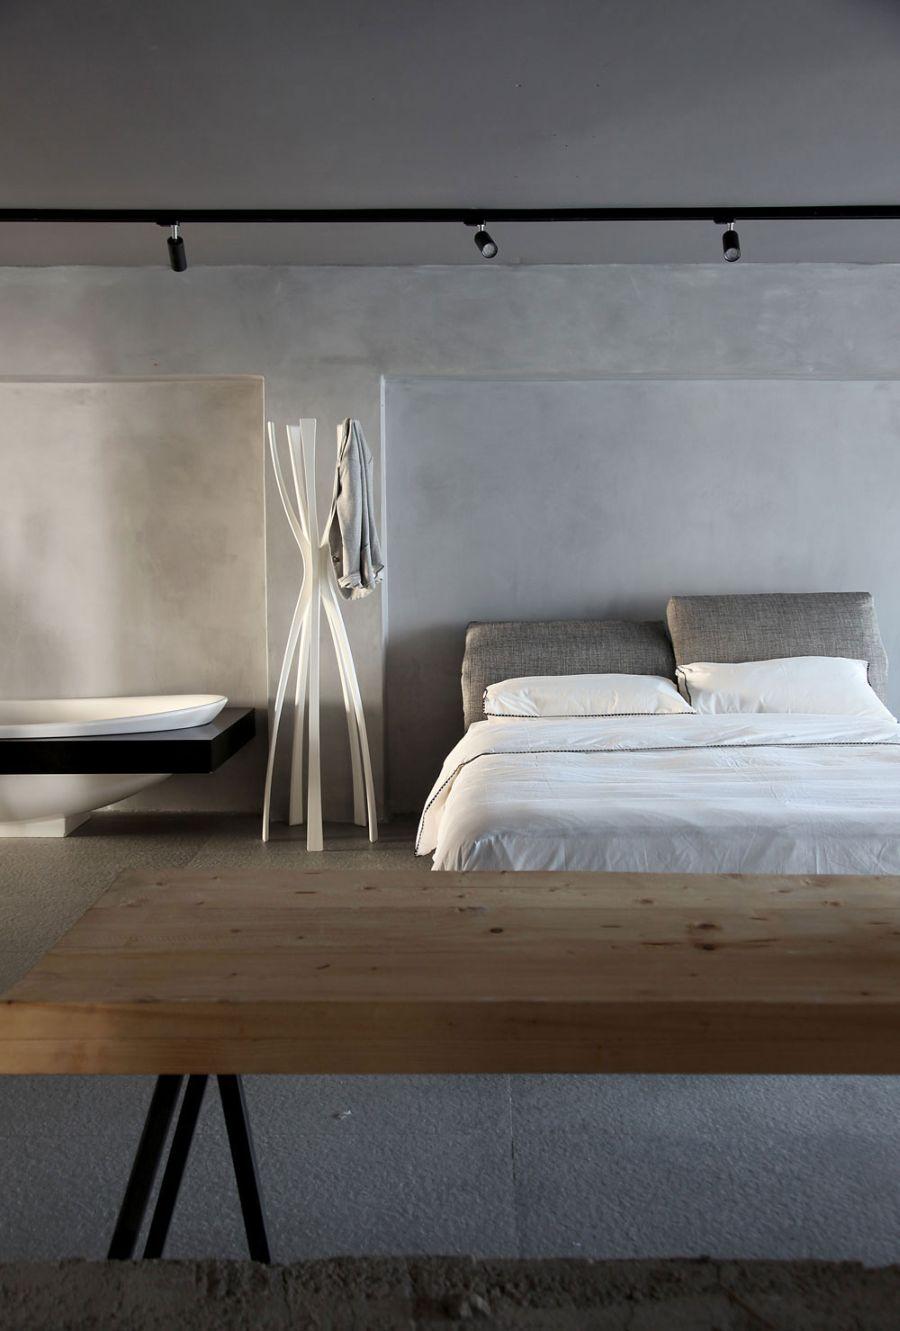 Track lighting idea in the bedroom